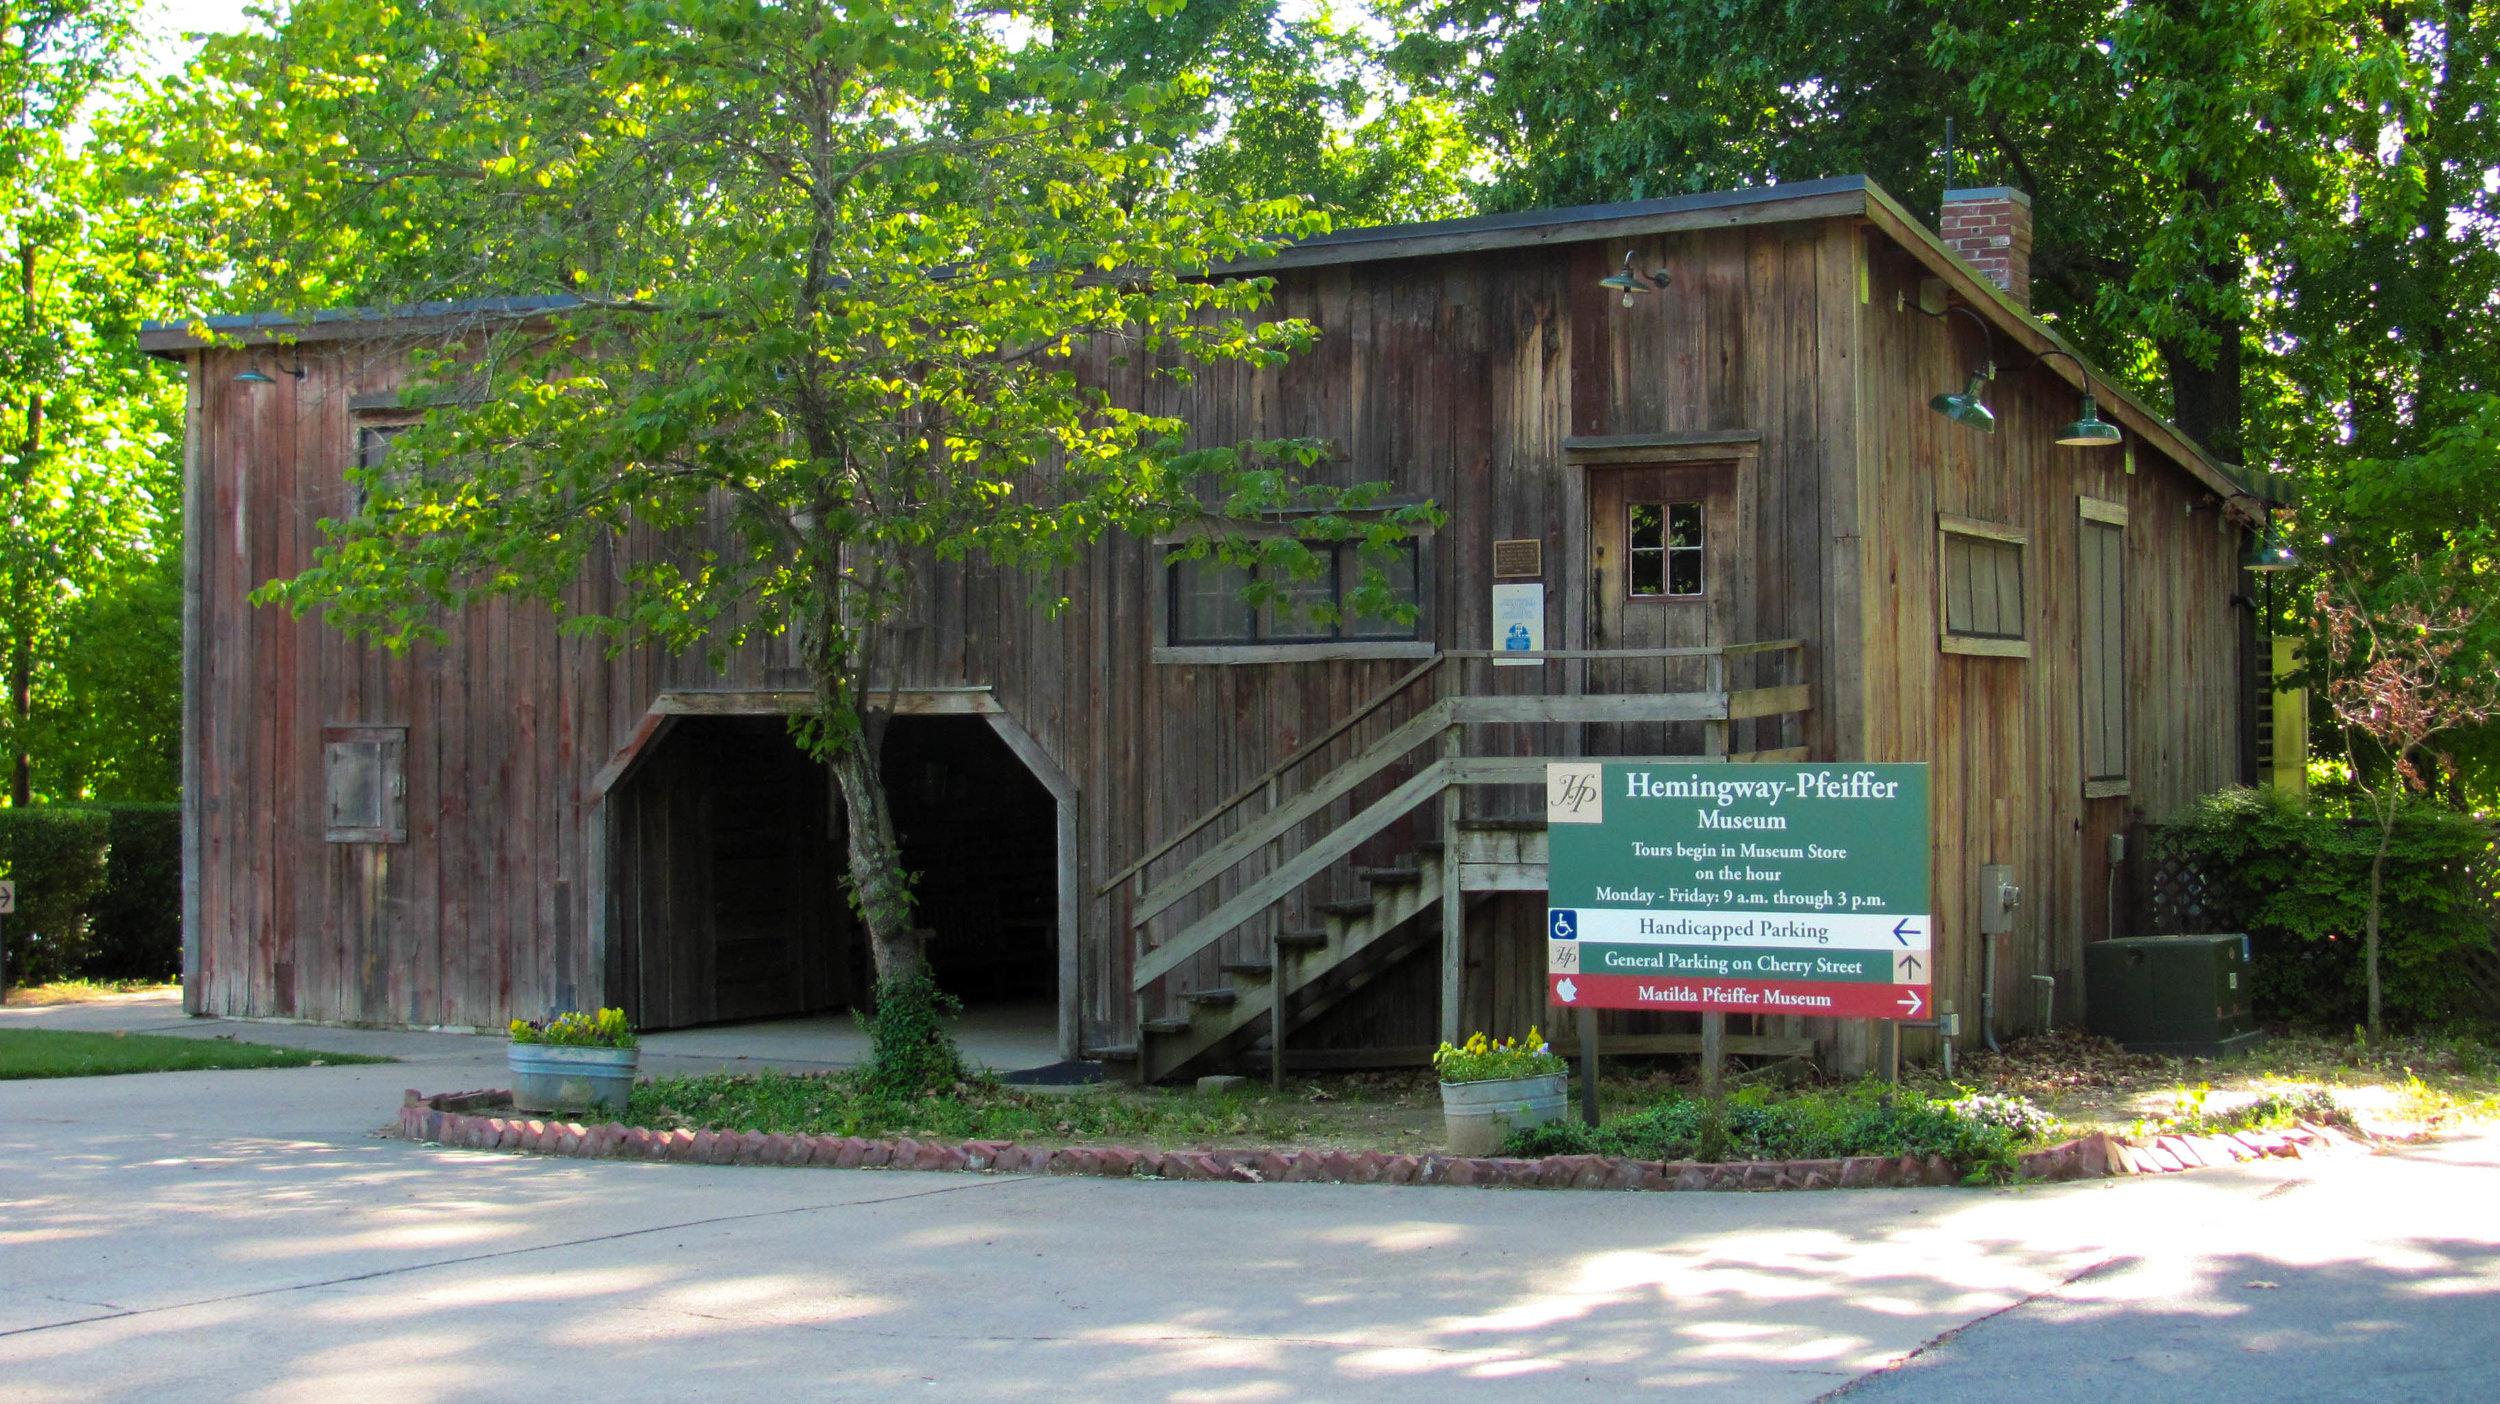 Hemingway-Pfeiffer Museum Piggott, Arkansas